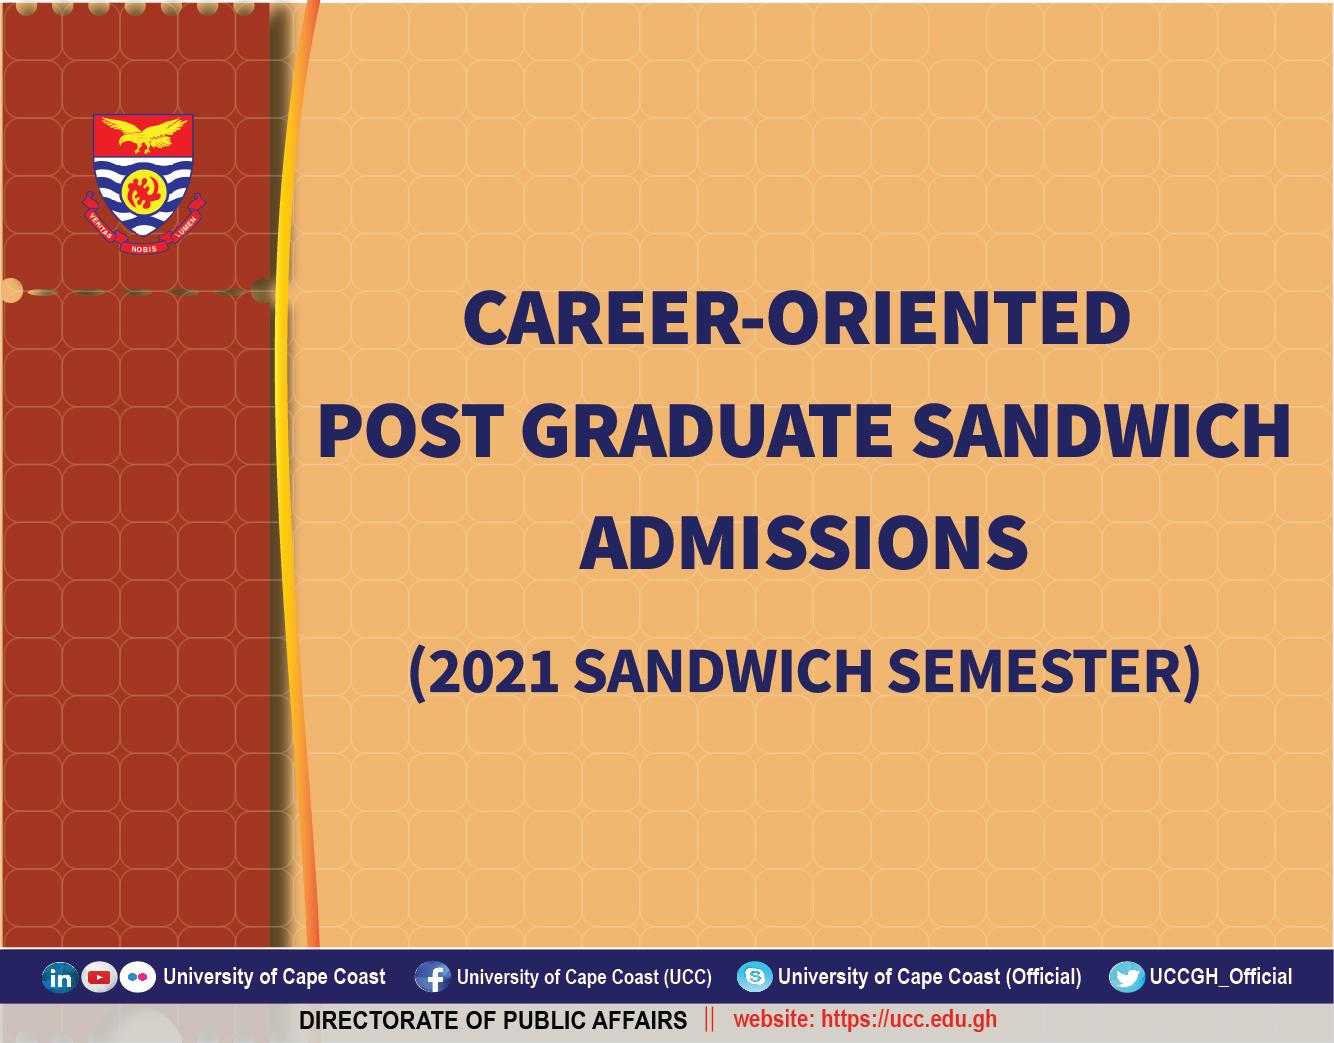 Post Graduate Sandwich 2021